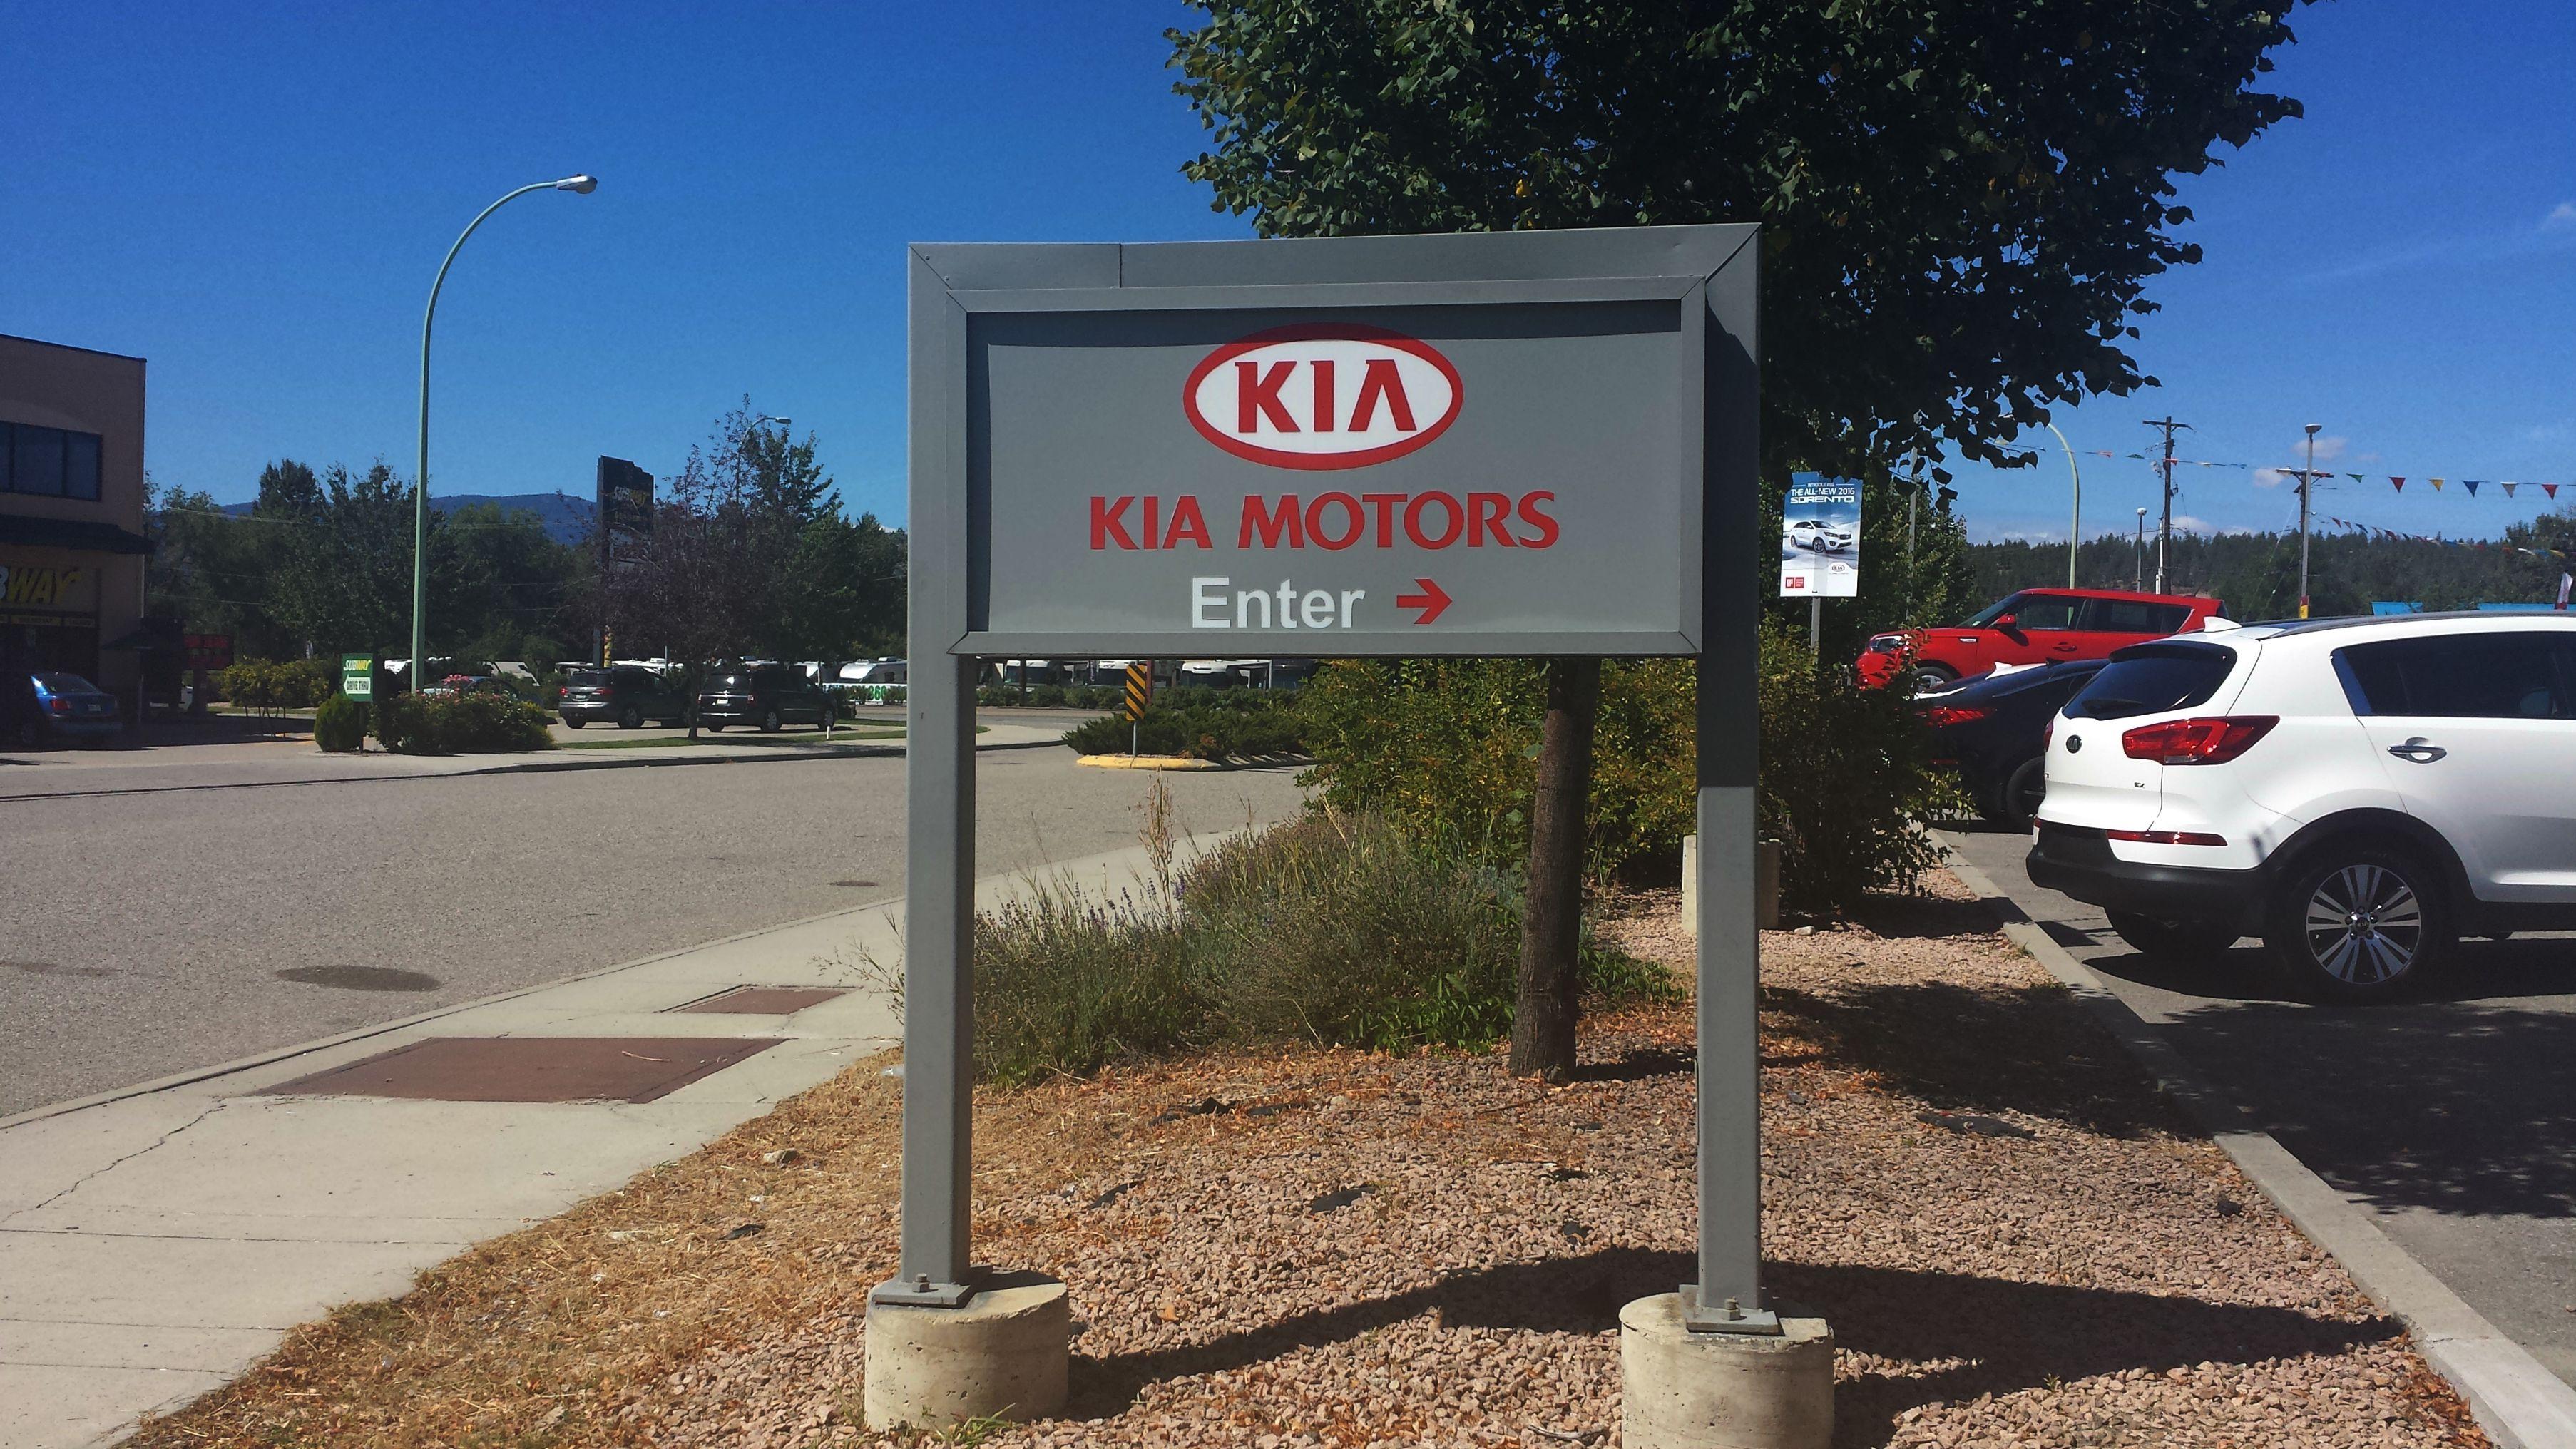 New and used kia dealership in kelowna kelowna kia autos for Kia motors customer service number